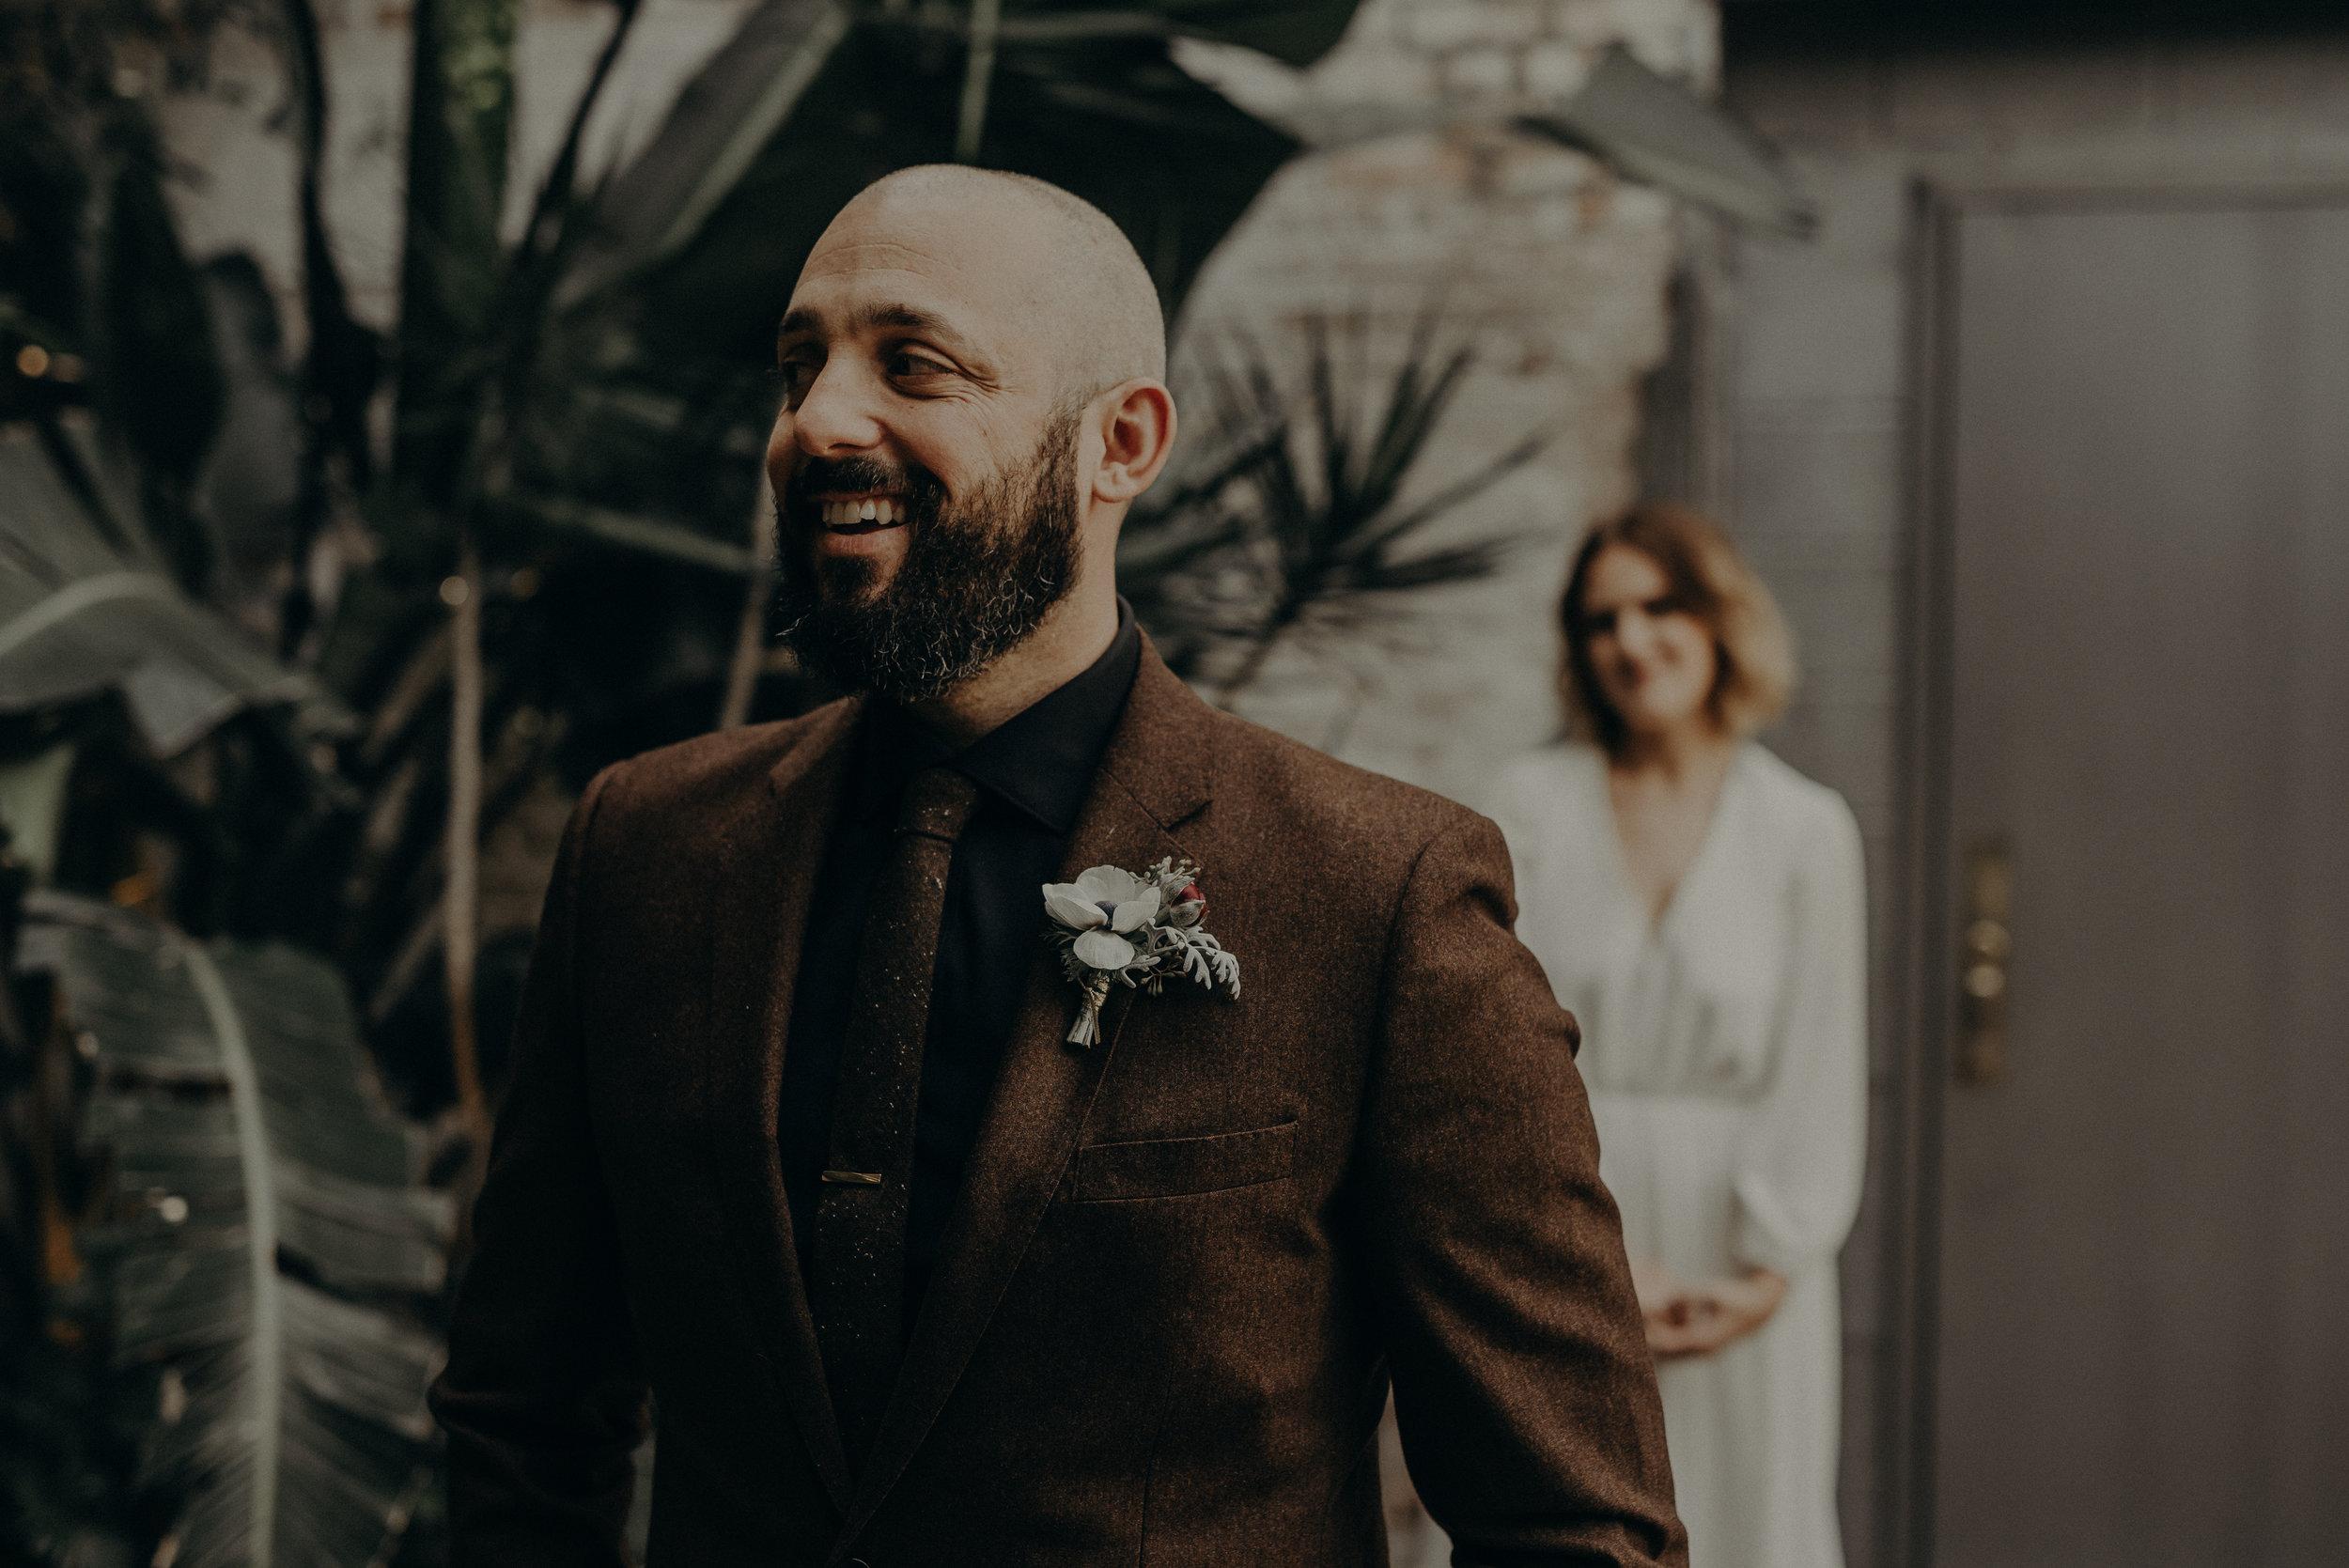 Isaiah + Taylor Photography - Reese + Jonathan Wedding-035.jpg